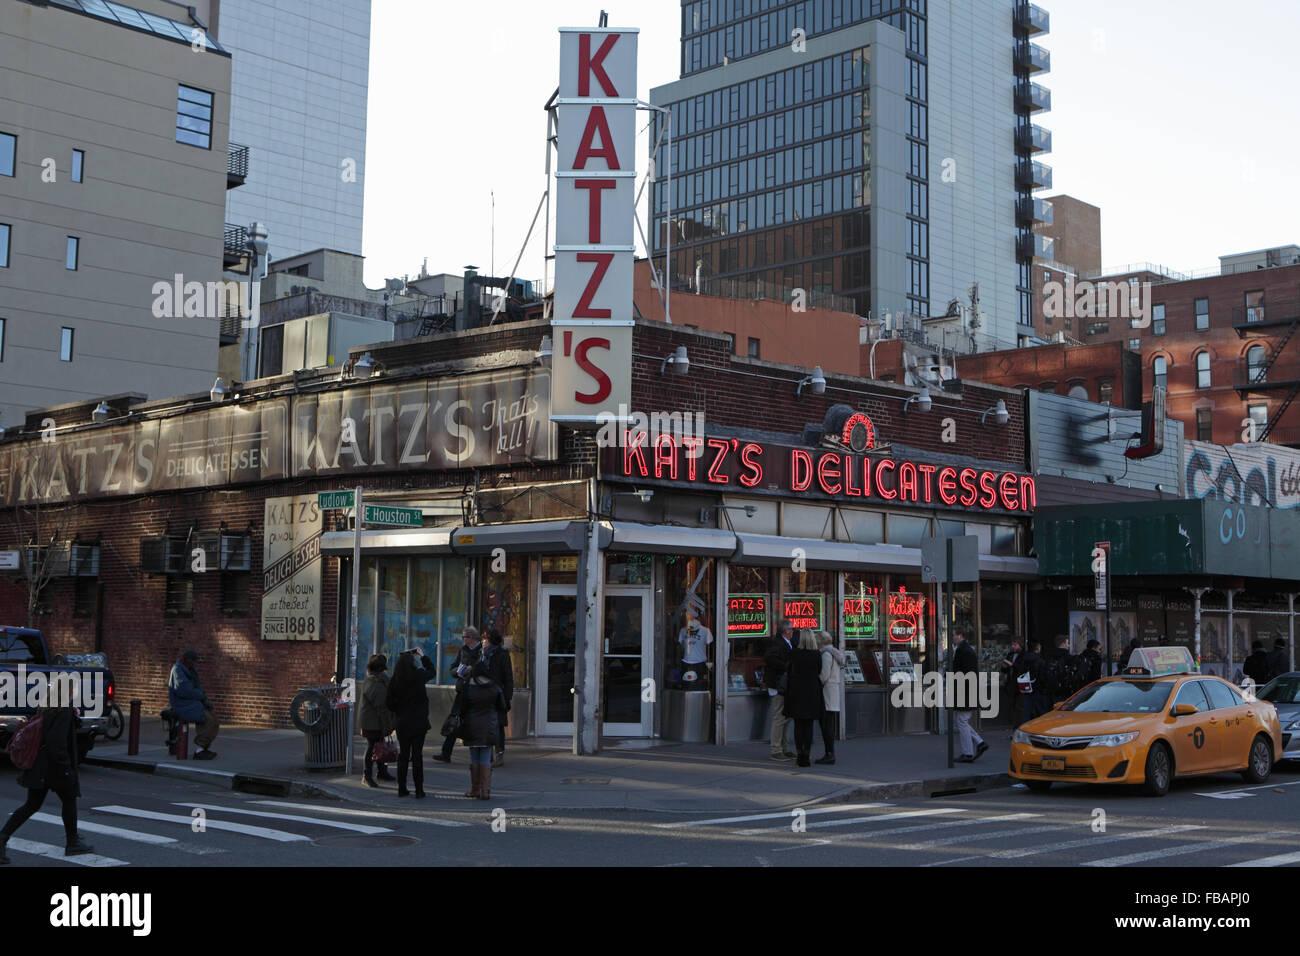 Katz's Delicatessen on Houston Street on the Lower East Side of Manhattan - Stock Image